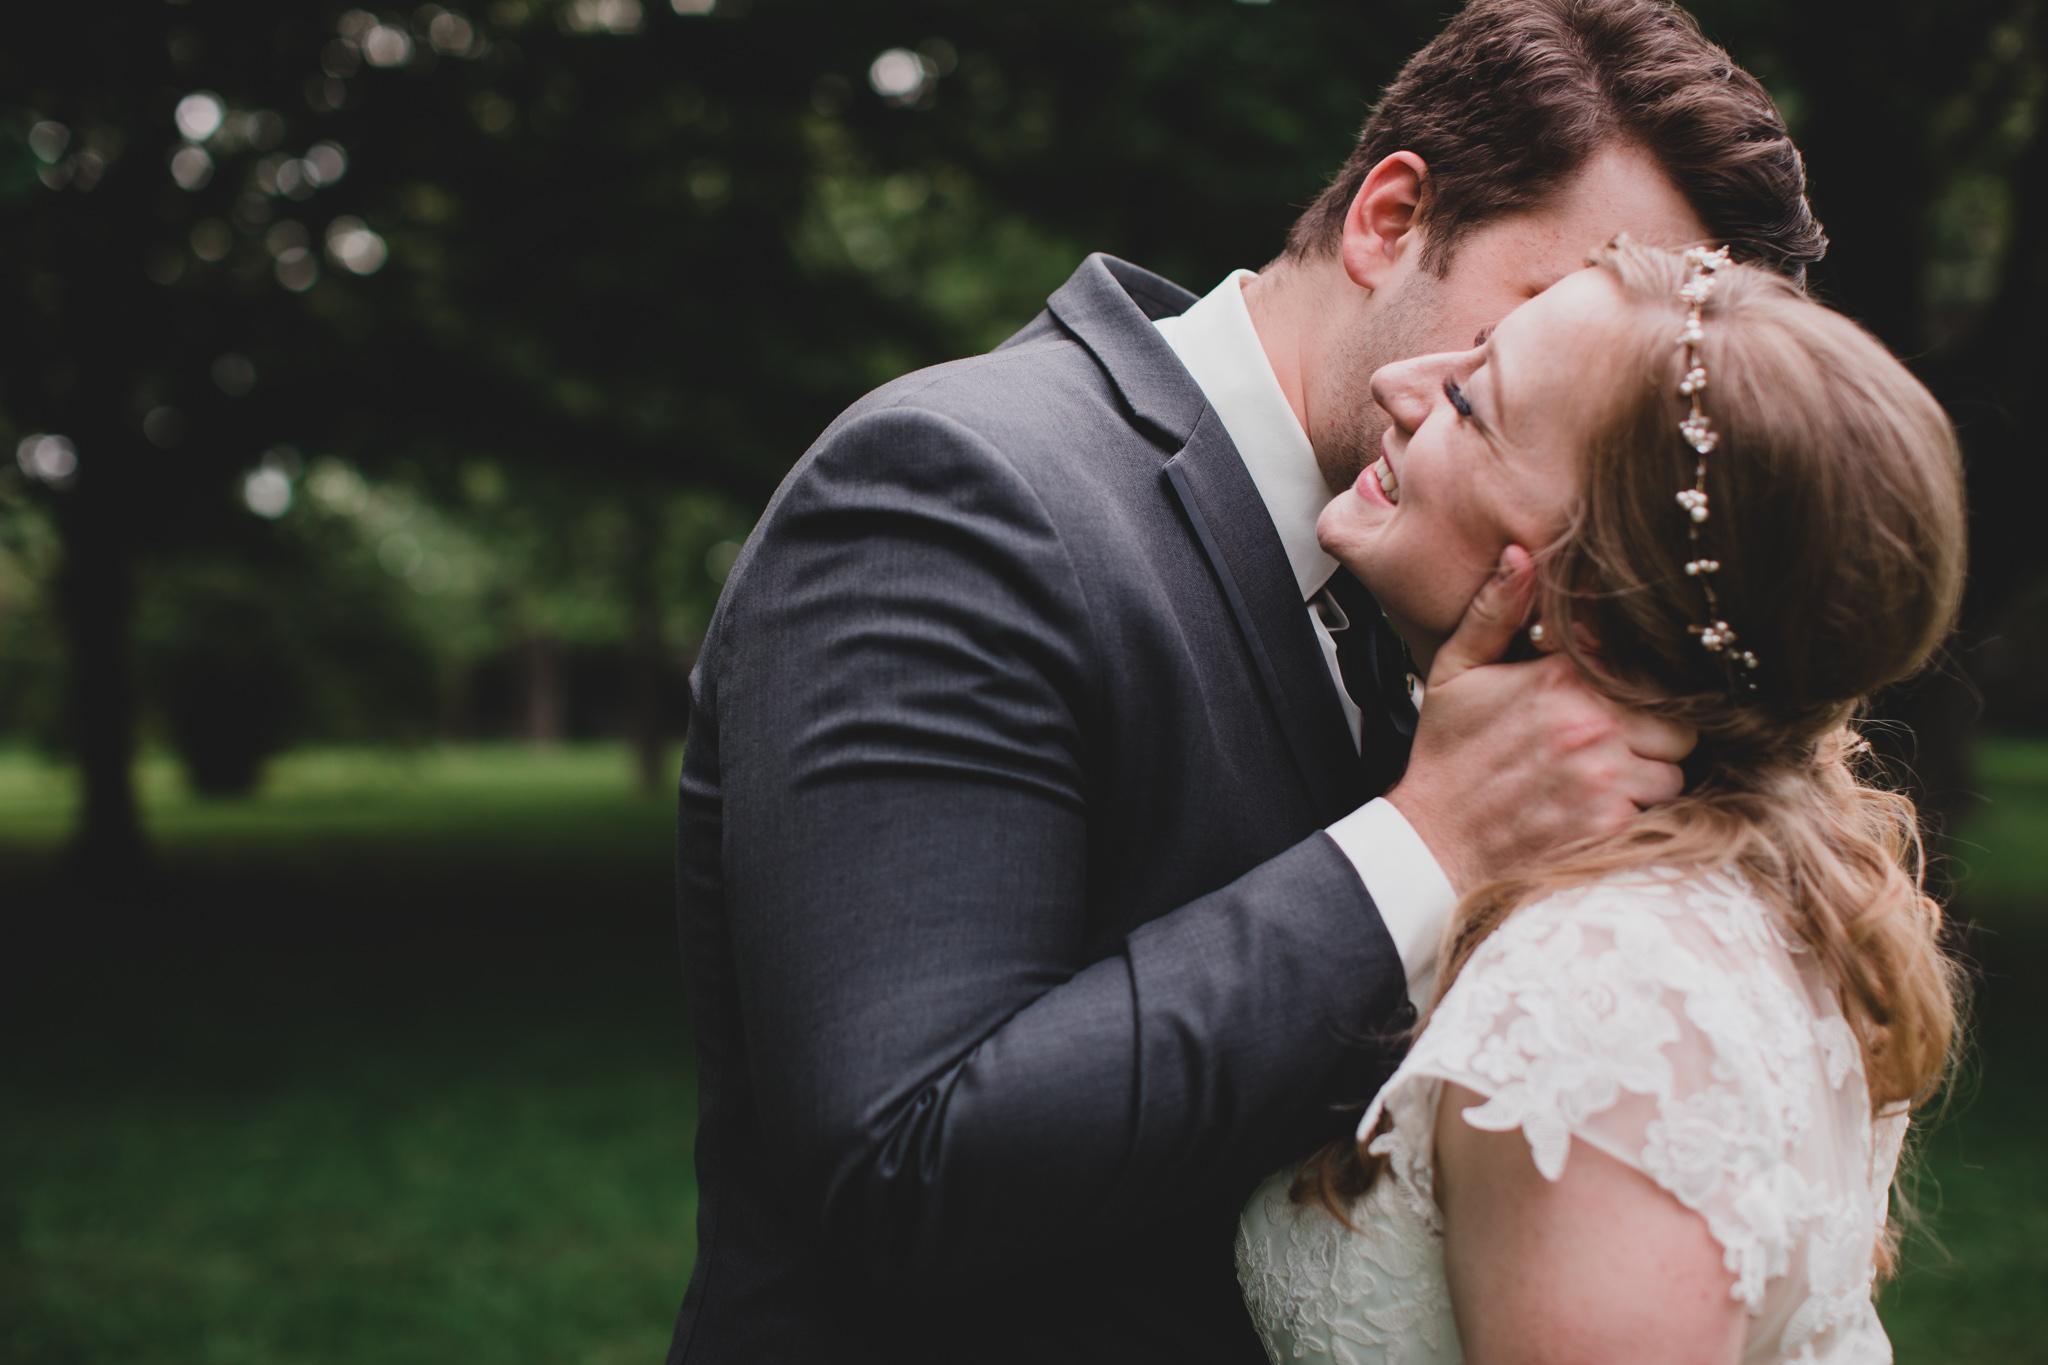 545-WEB-Jonathan-Kuhn-Photography-BenHayley-Wedding-4983.jpg